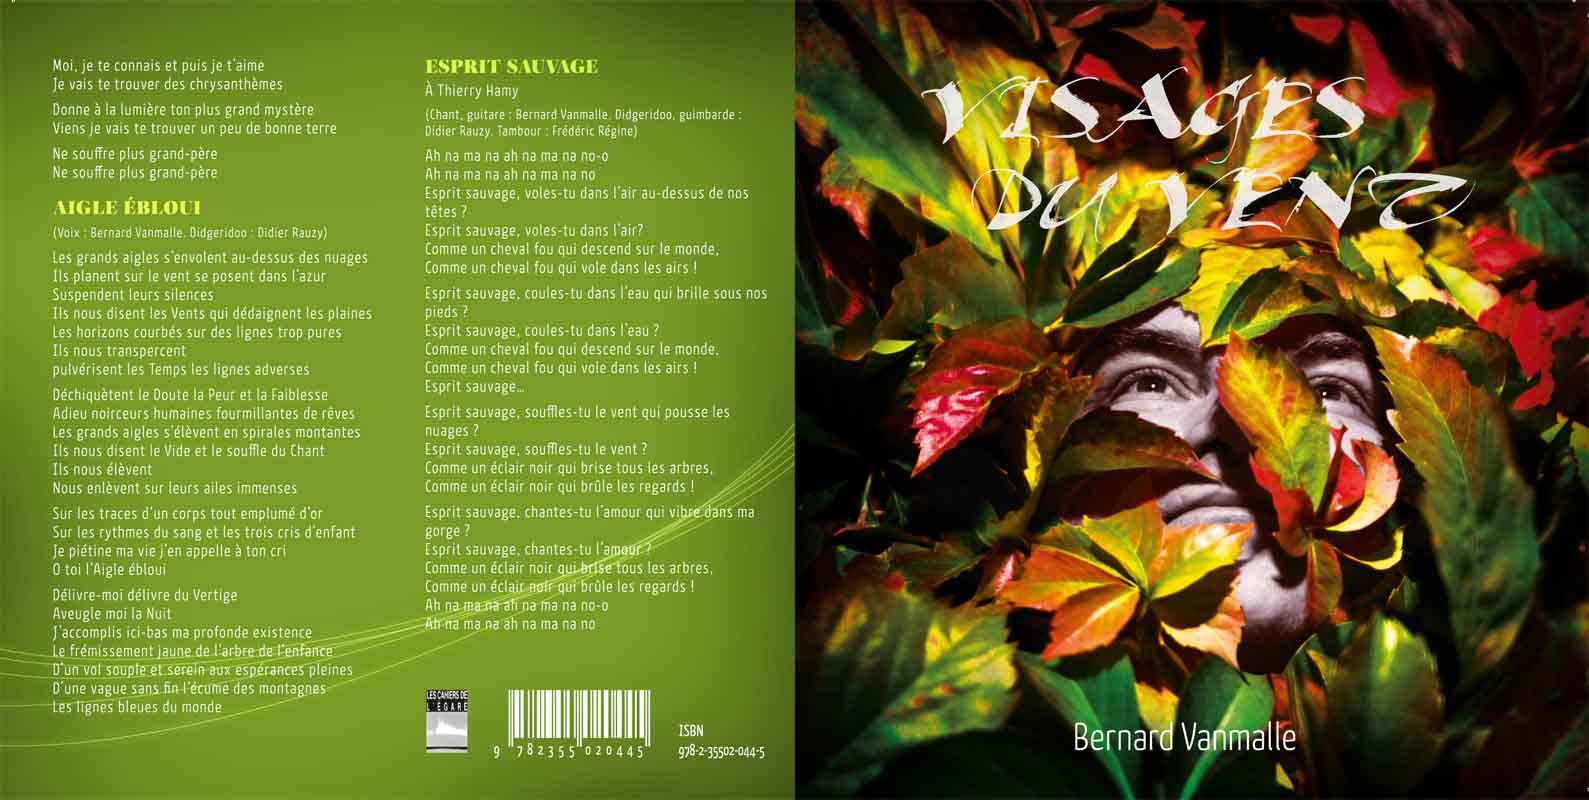 chansons de bernard vanmalle poète